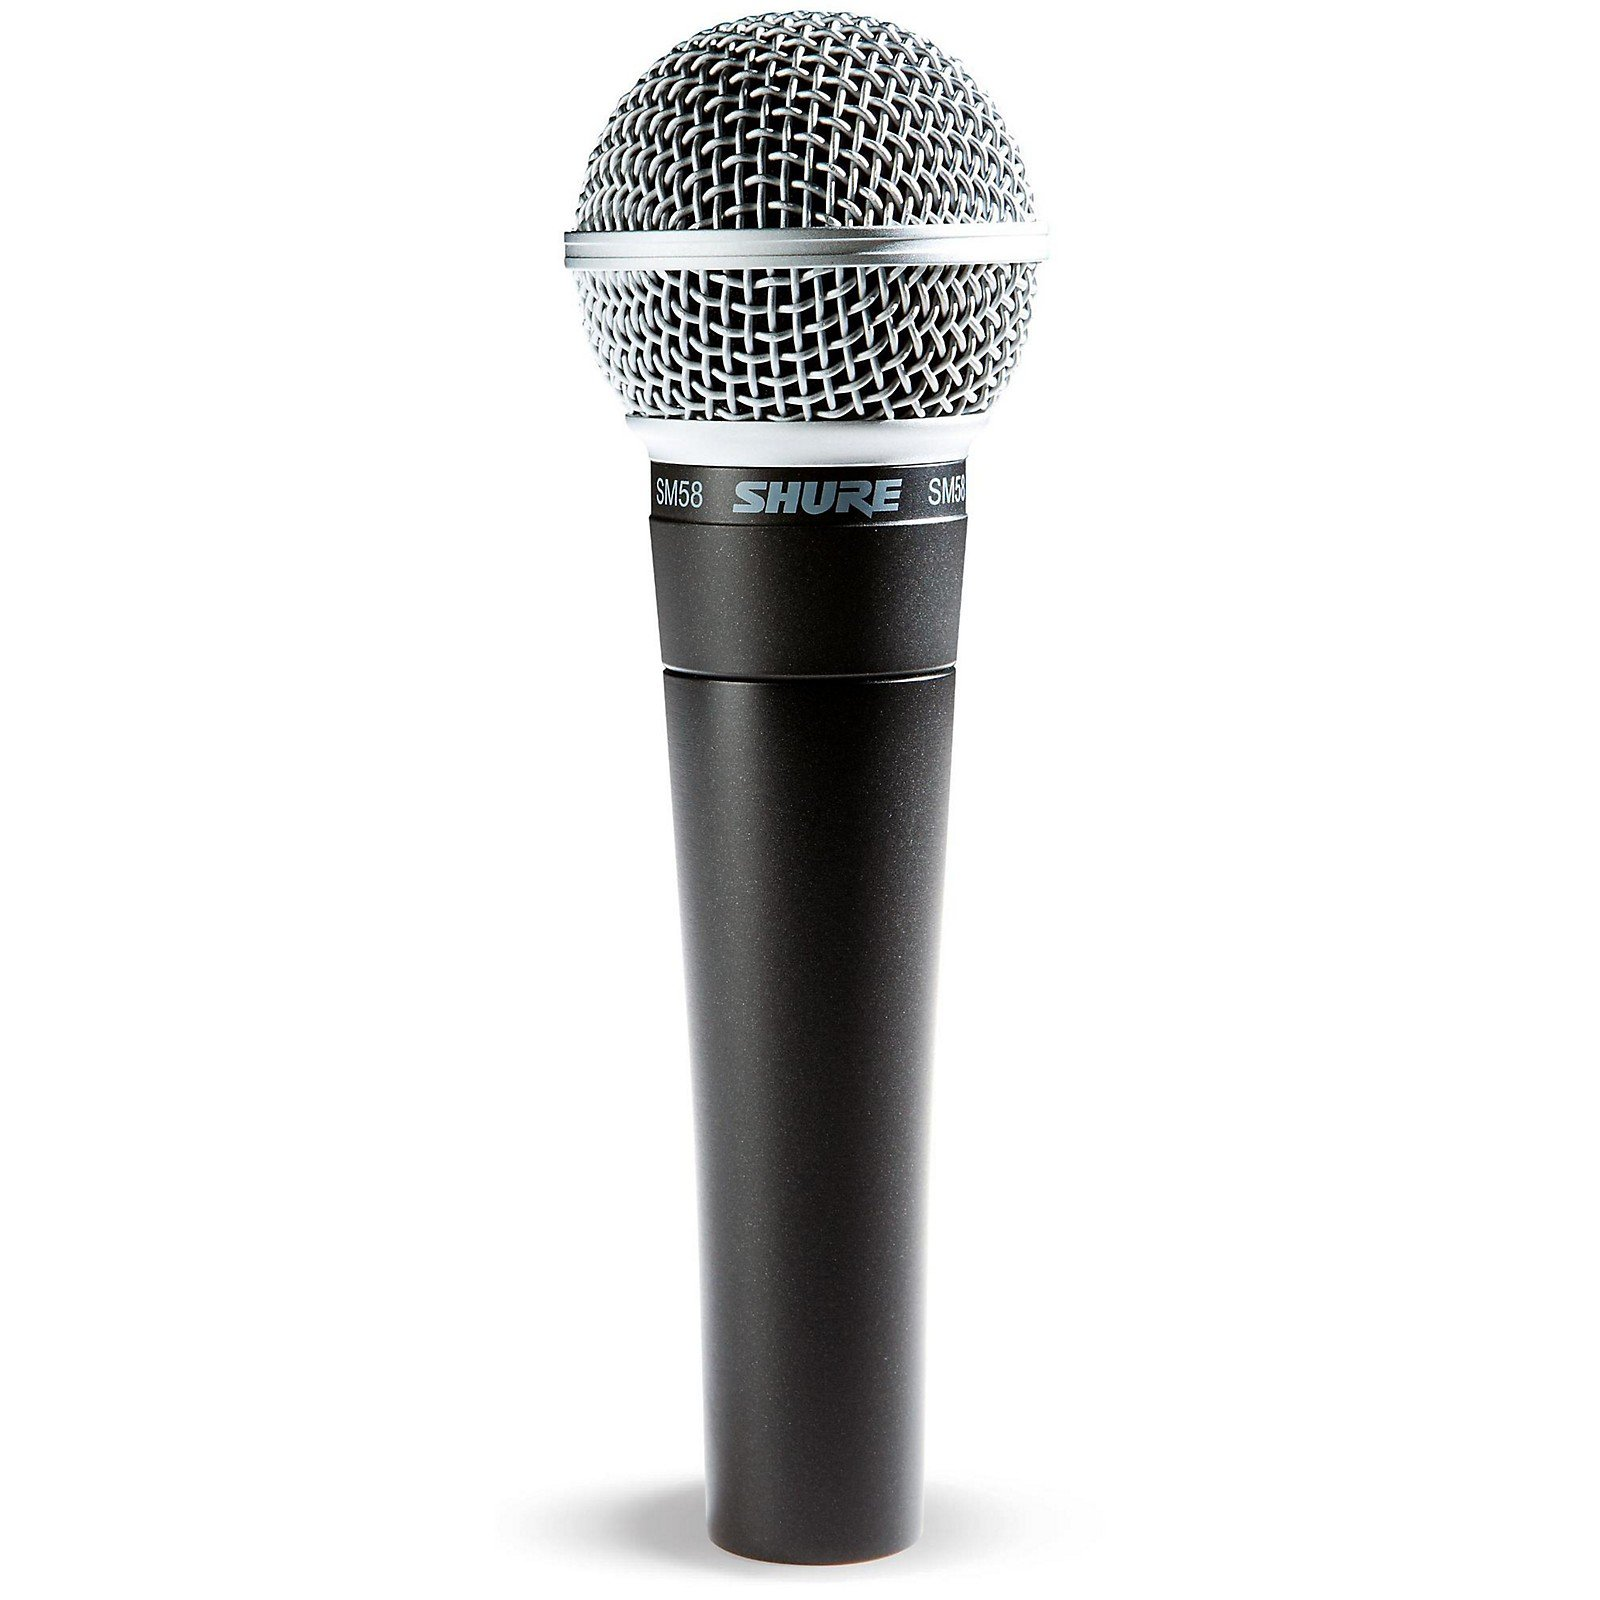 Shure SM58 Dynamic Cardiod Microphone